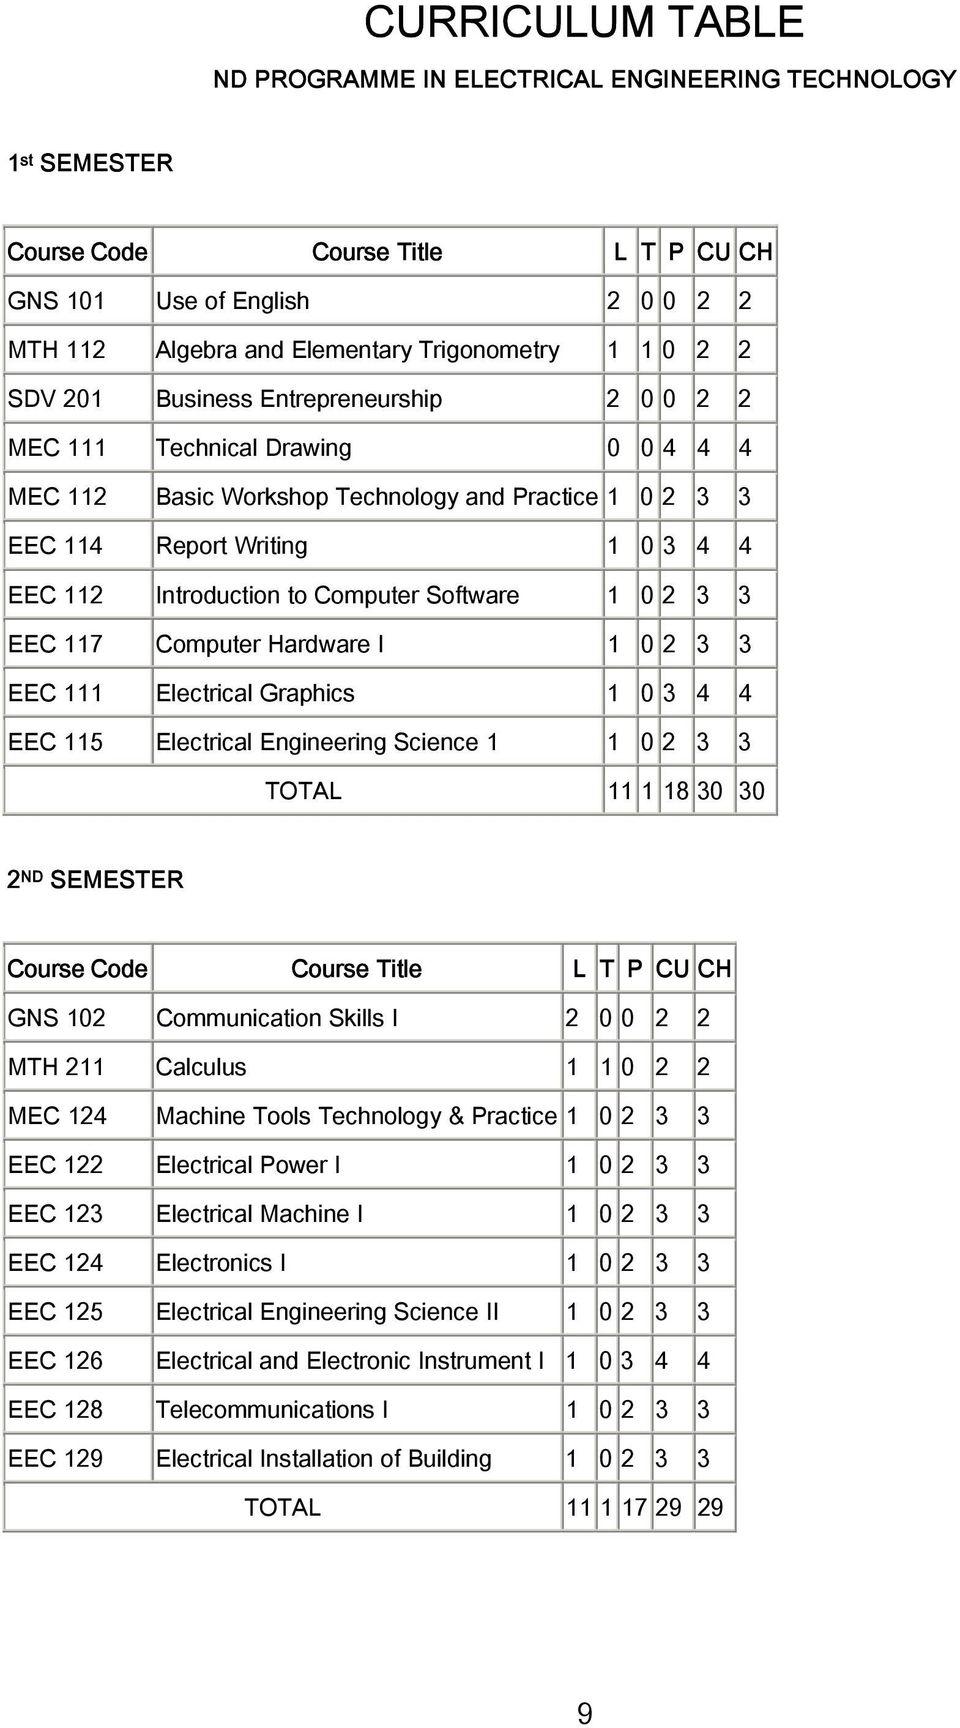 hight resolution of computer software 1 0 2 3 3 eec 117 computer hardware i 1 0 2 3